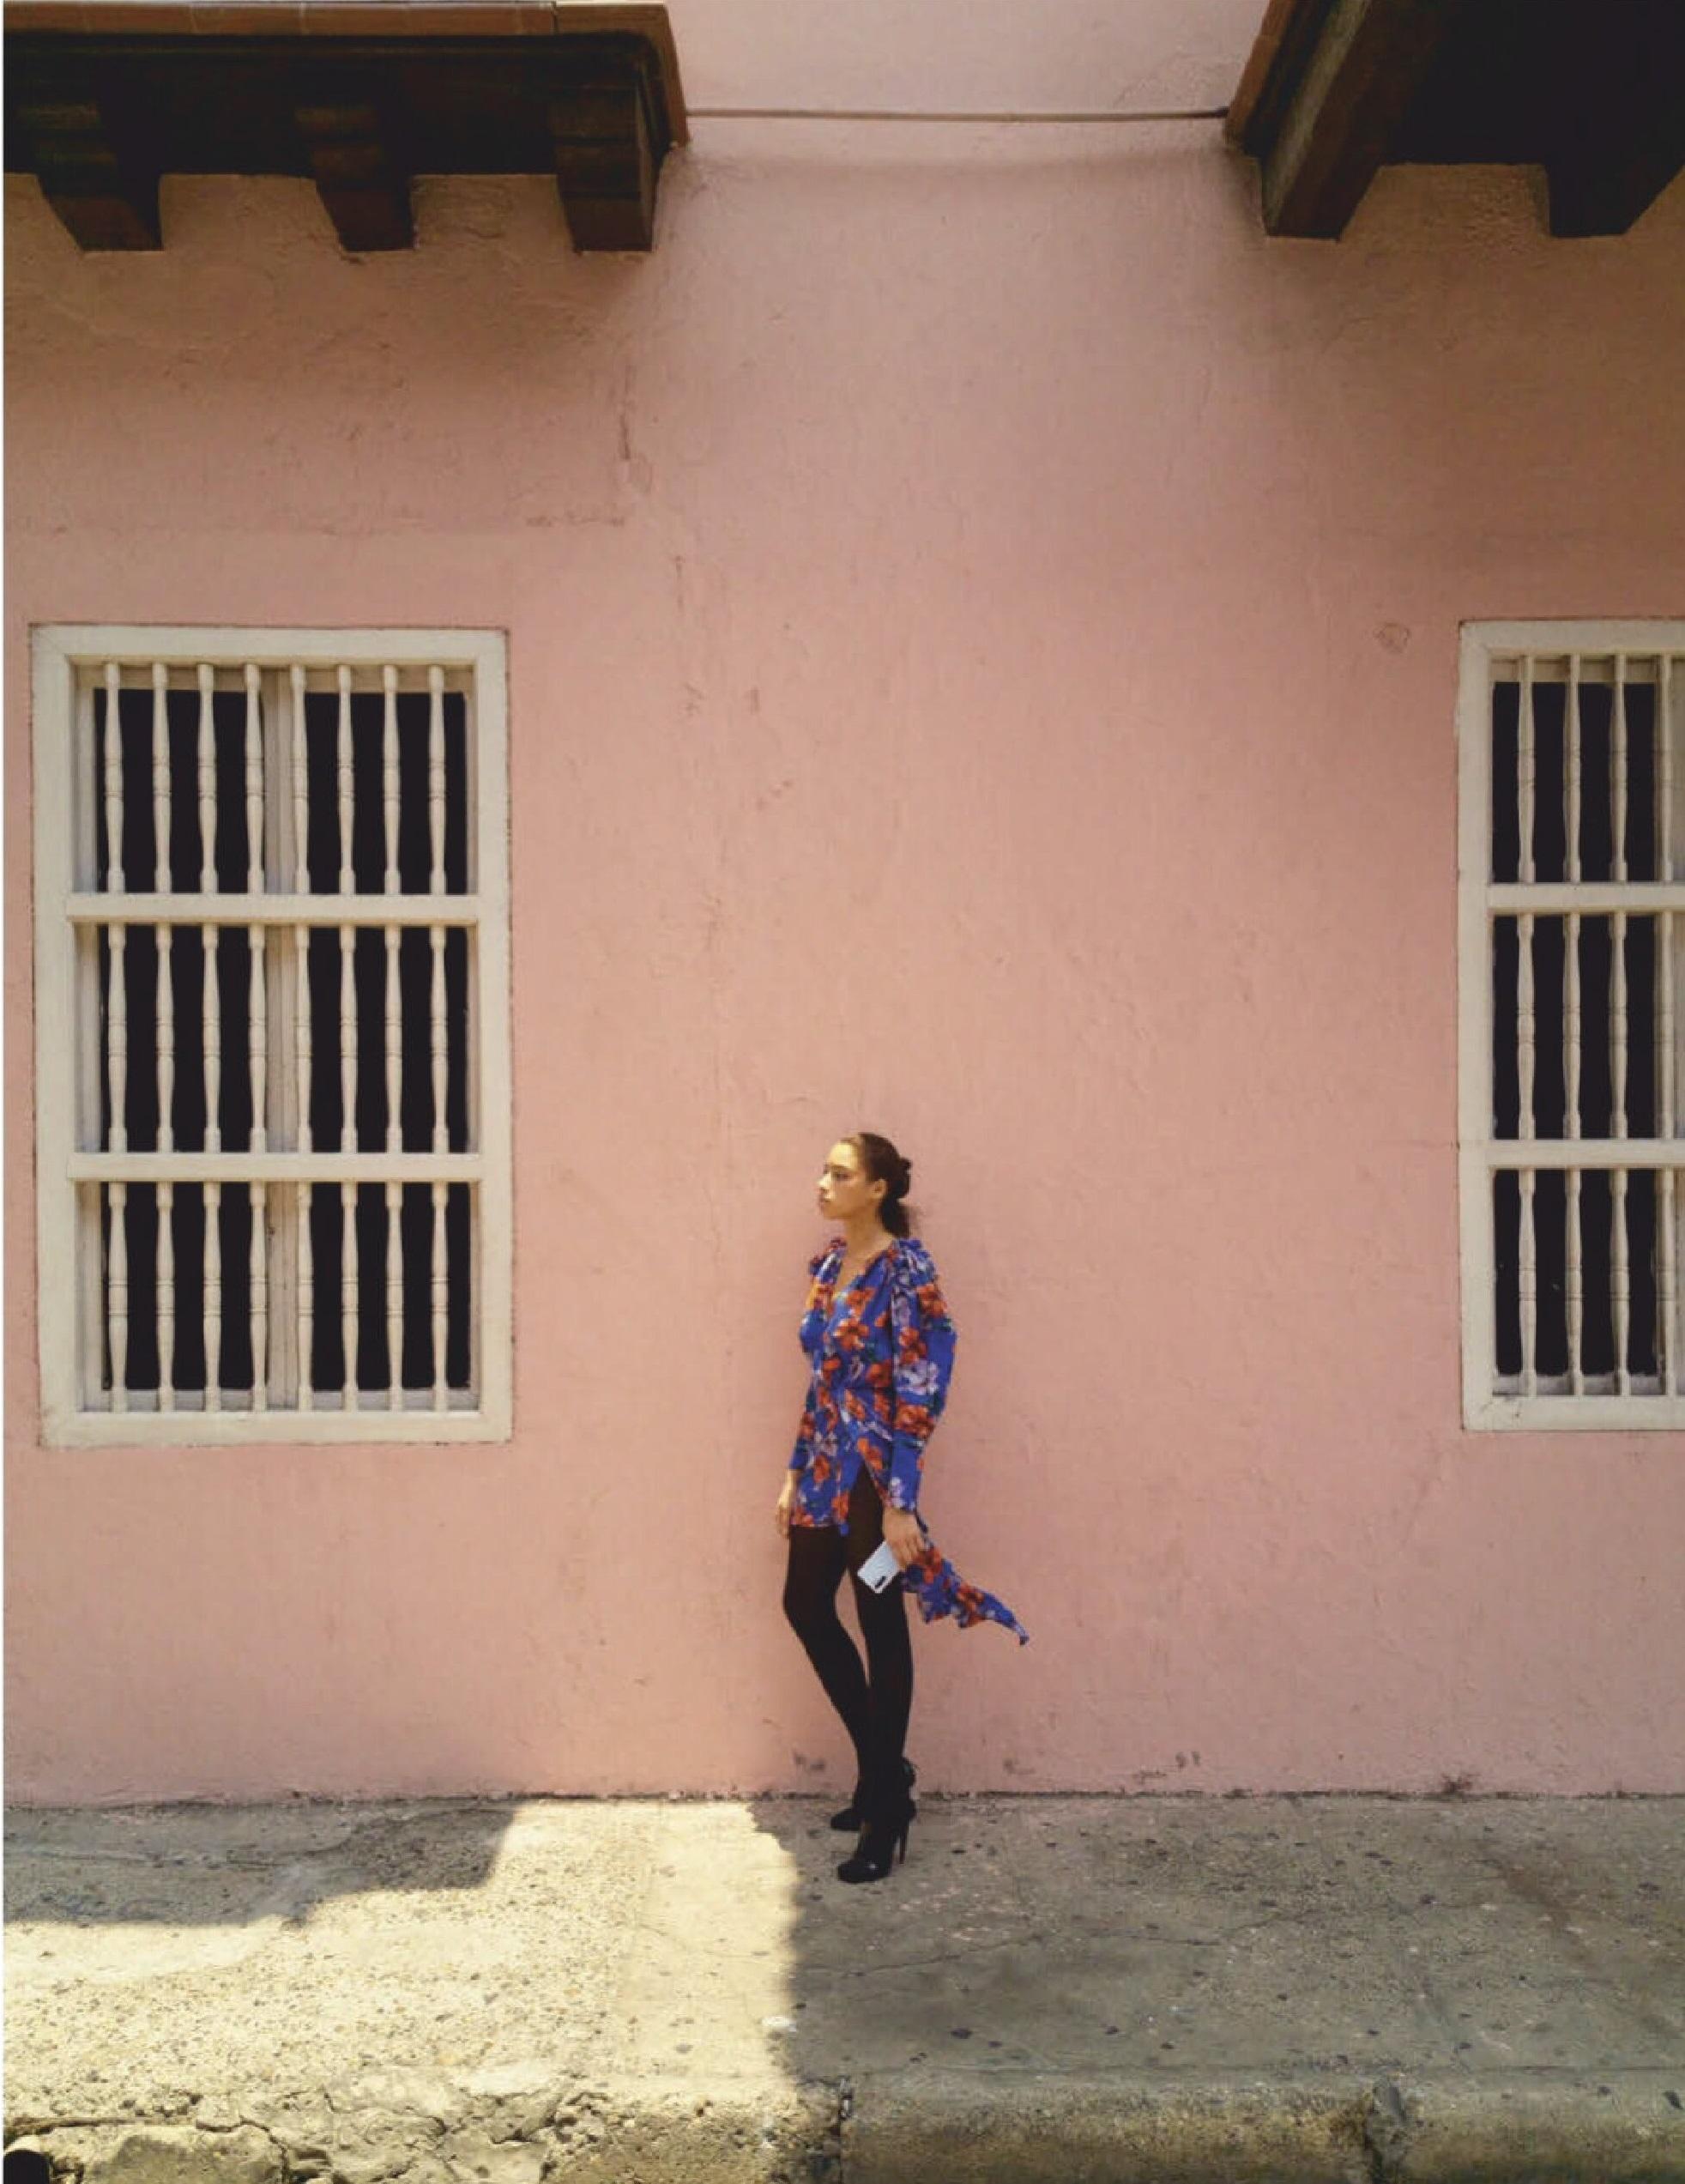 Khadija-Red-Thunder-Bjorn-Iooss-Vogue-Latin-America-May-2019- (1).jpg